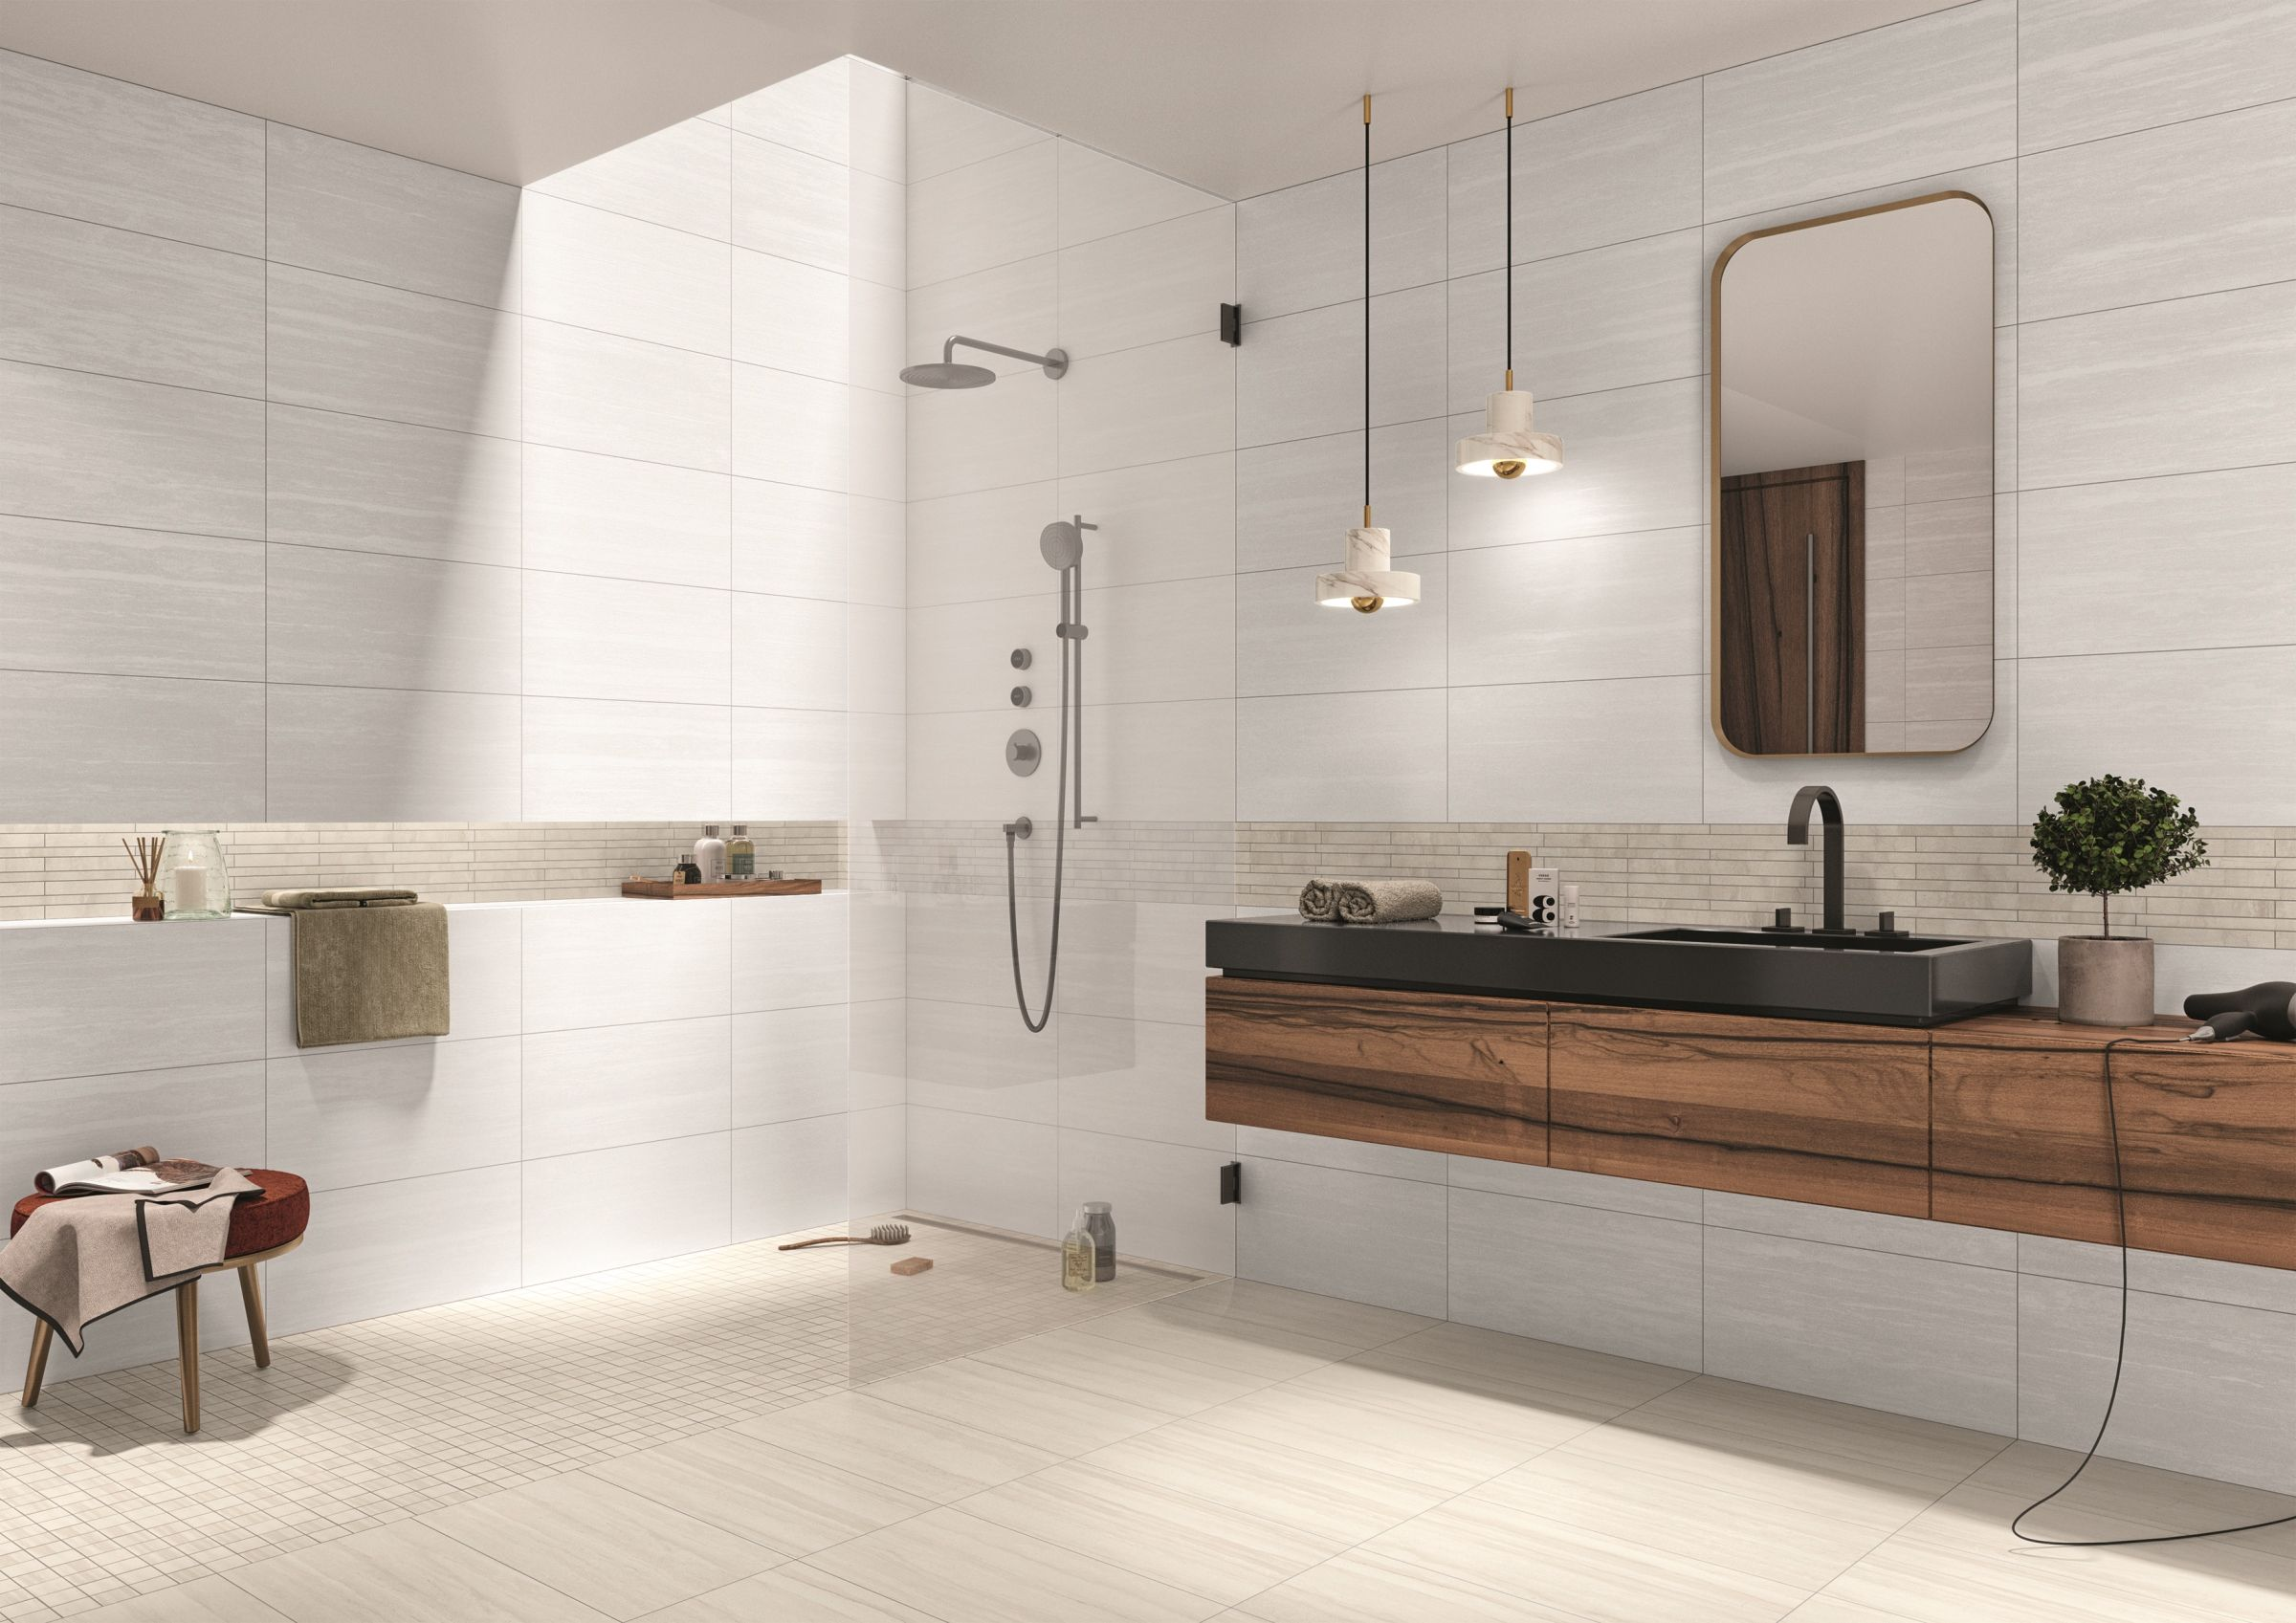 Badezimmerfliese Dusche Wandfliesen Modernes Badezimmerdesign